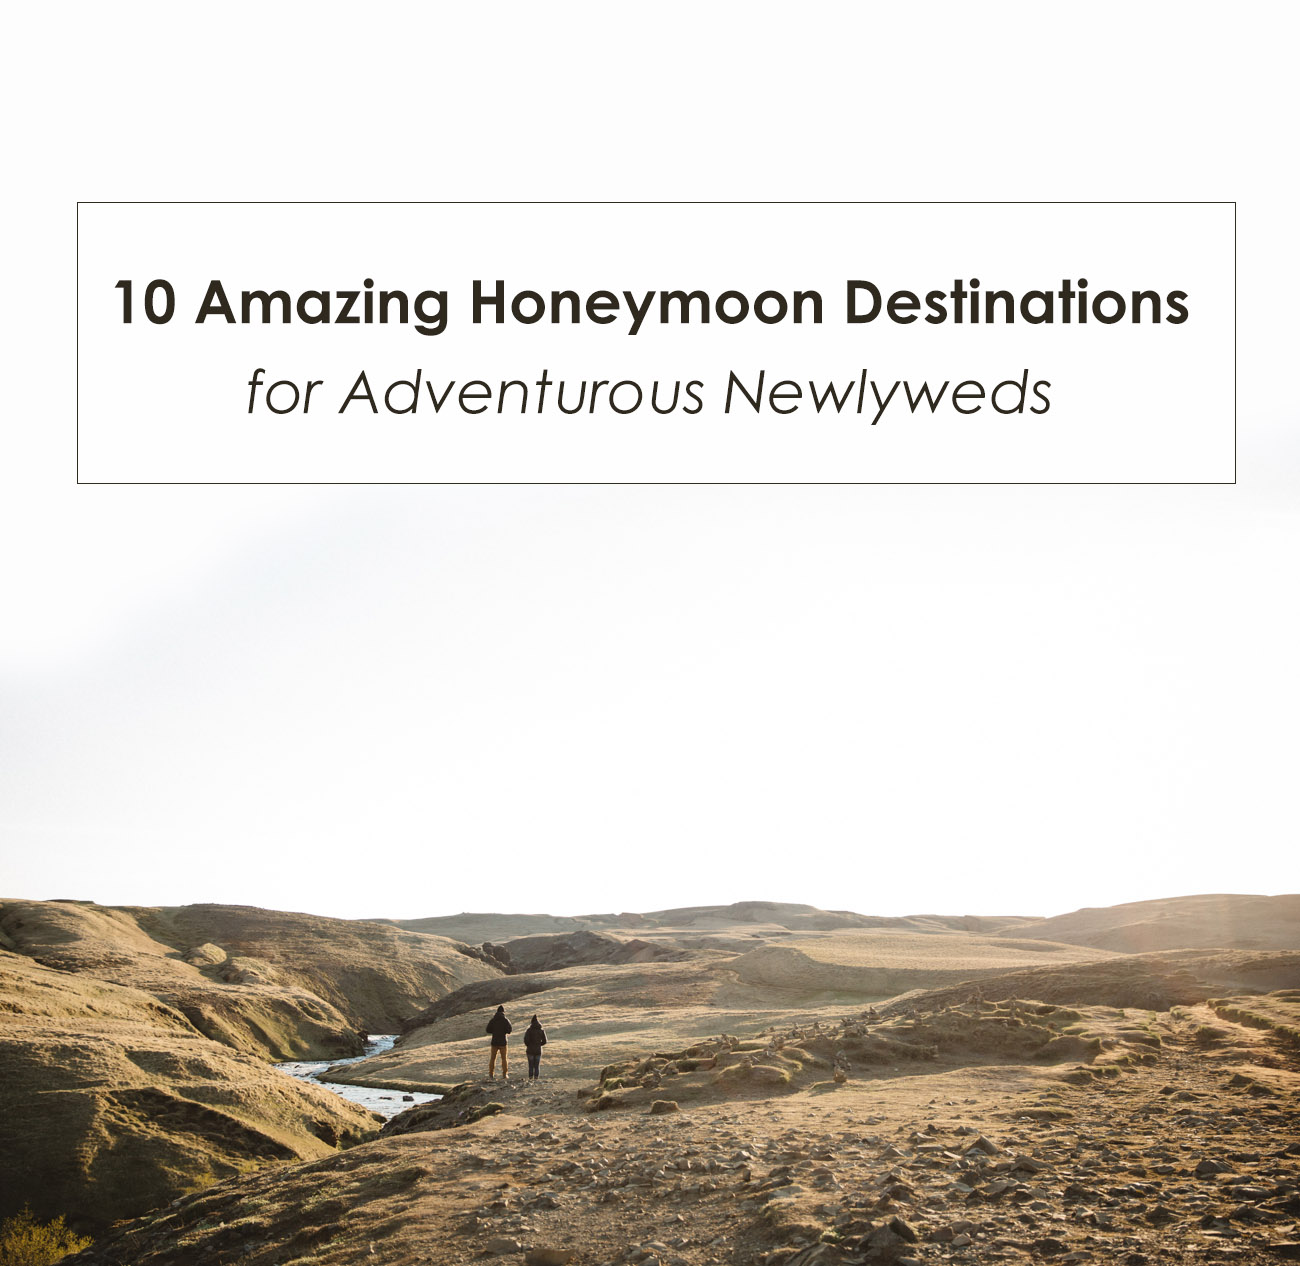 10 Amazing Honeymoon Destinations for Adventurous Newlyweds